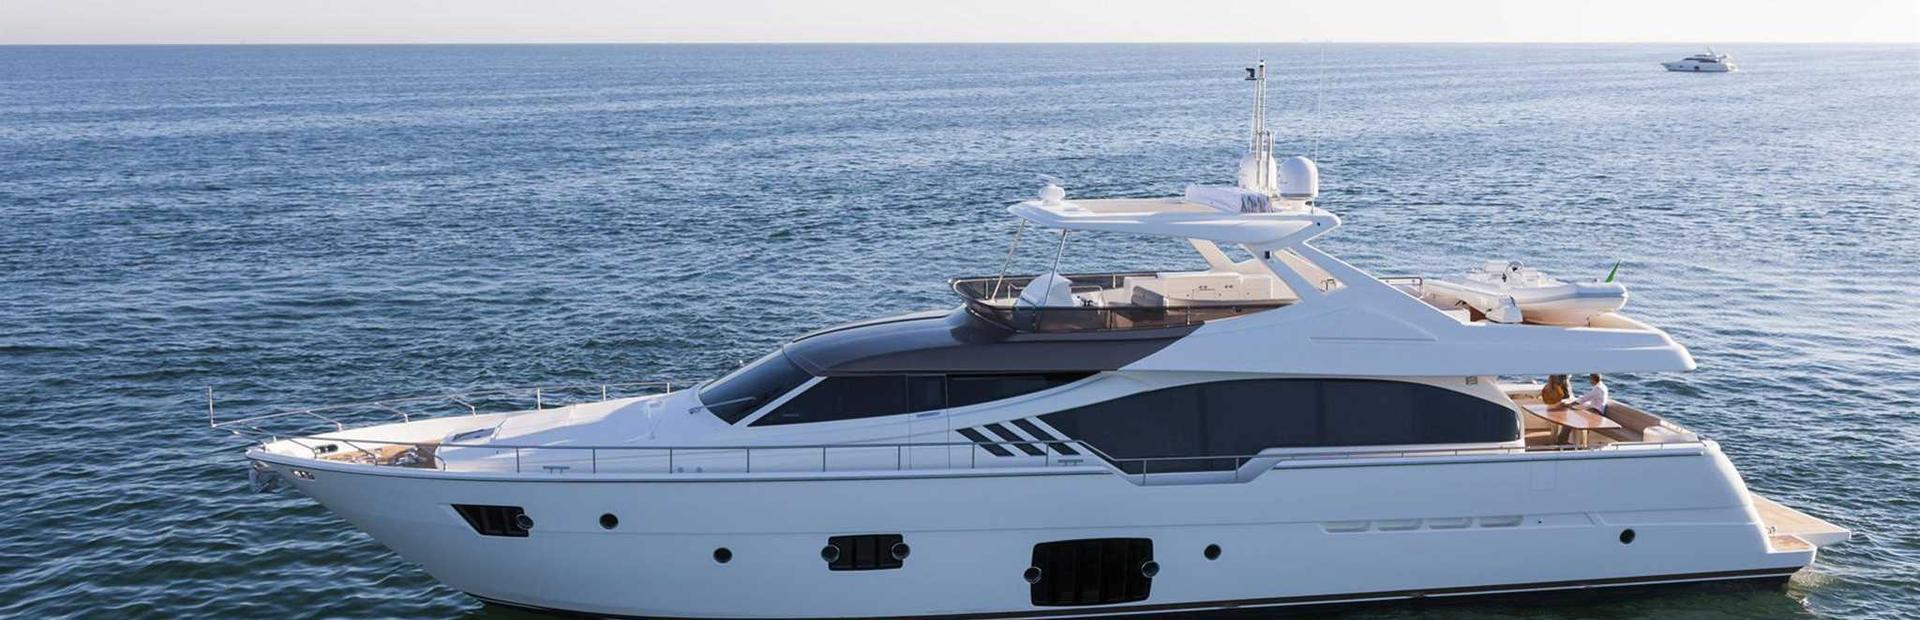 Ferretti 870 Yacht Charter